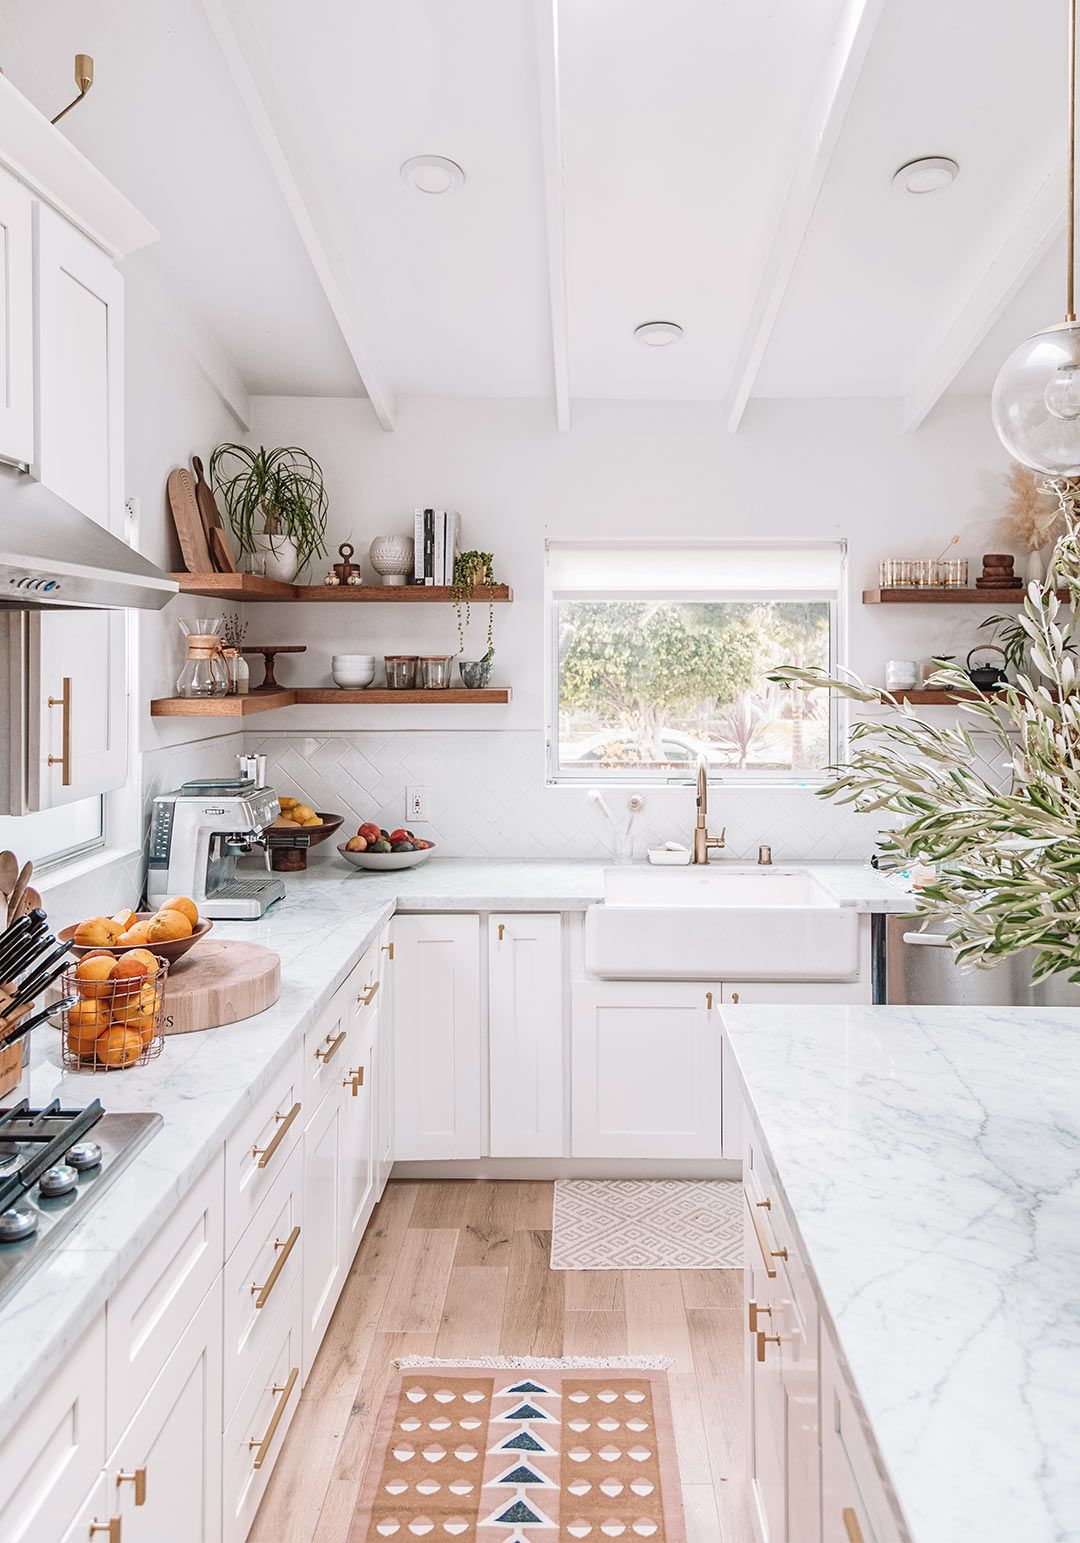 Amanda S Modern Neutral Home With Artistic Touches White Kitchen